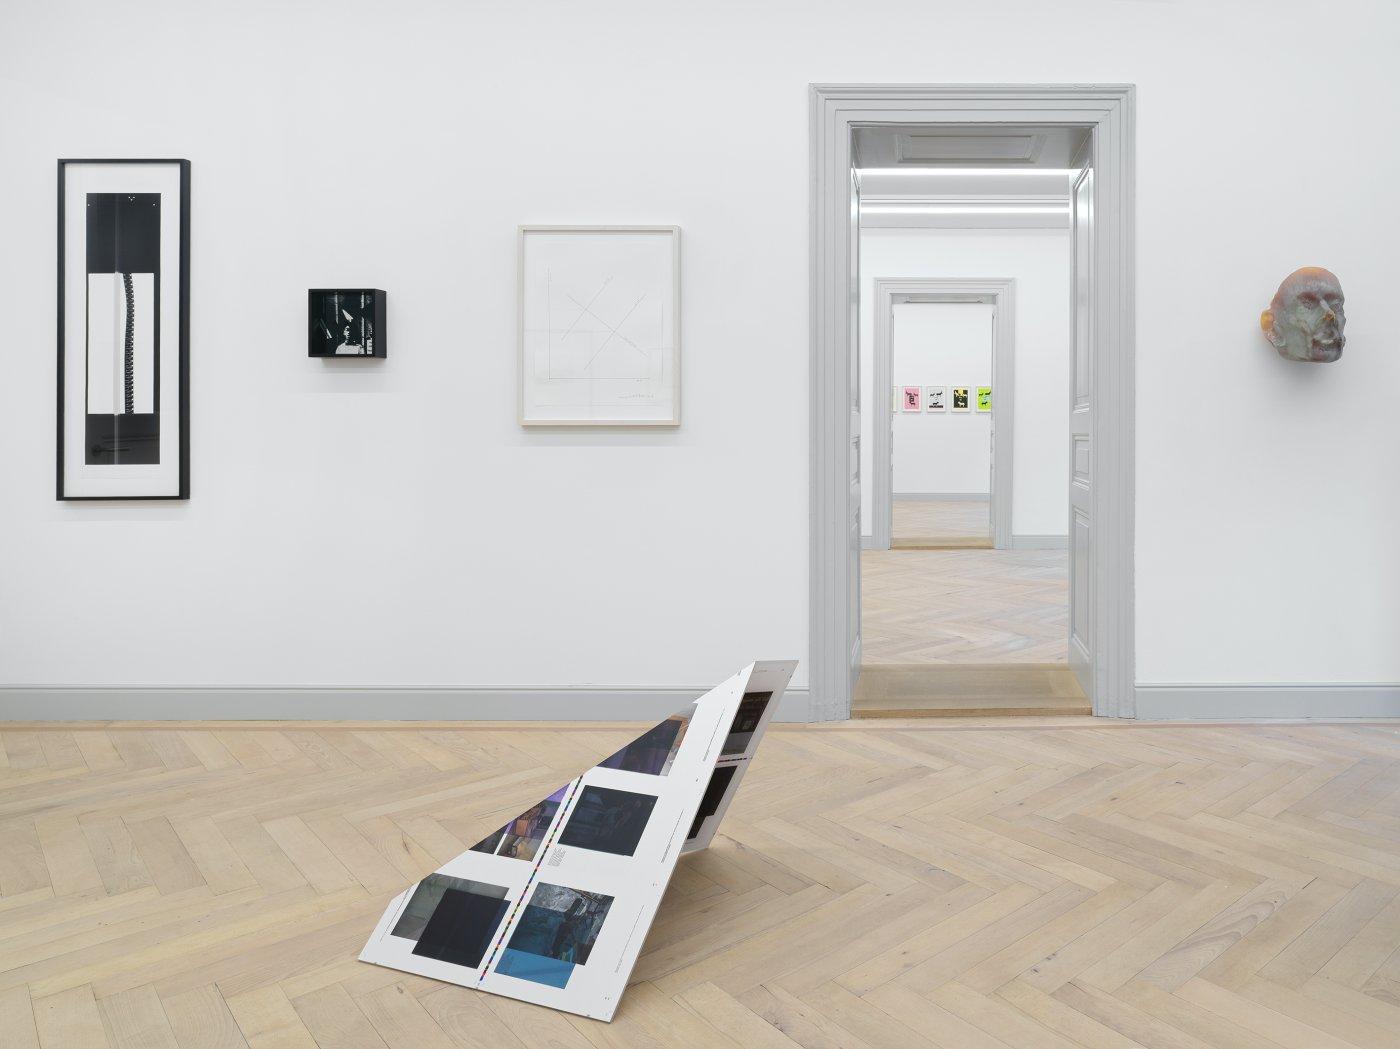 Galerie Eva Presenhuber All in One 10